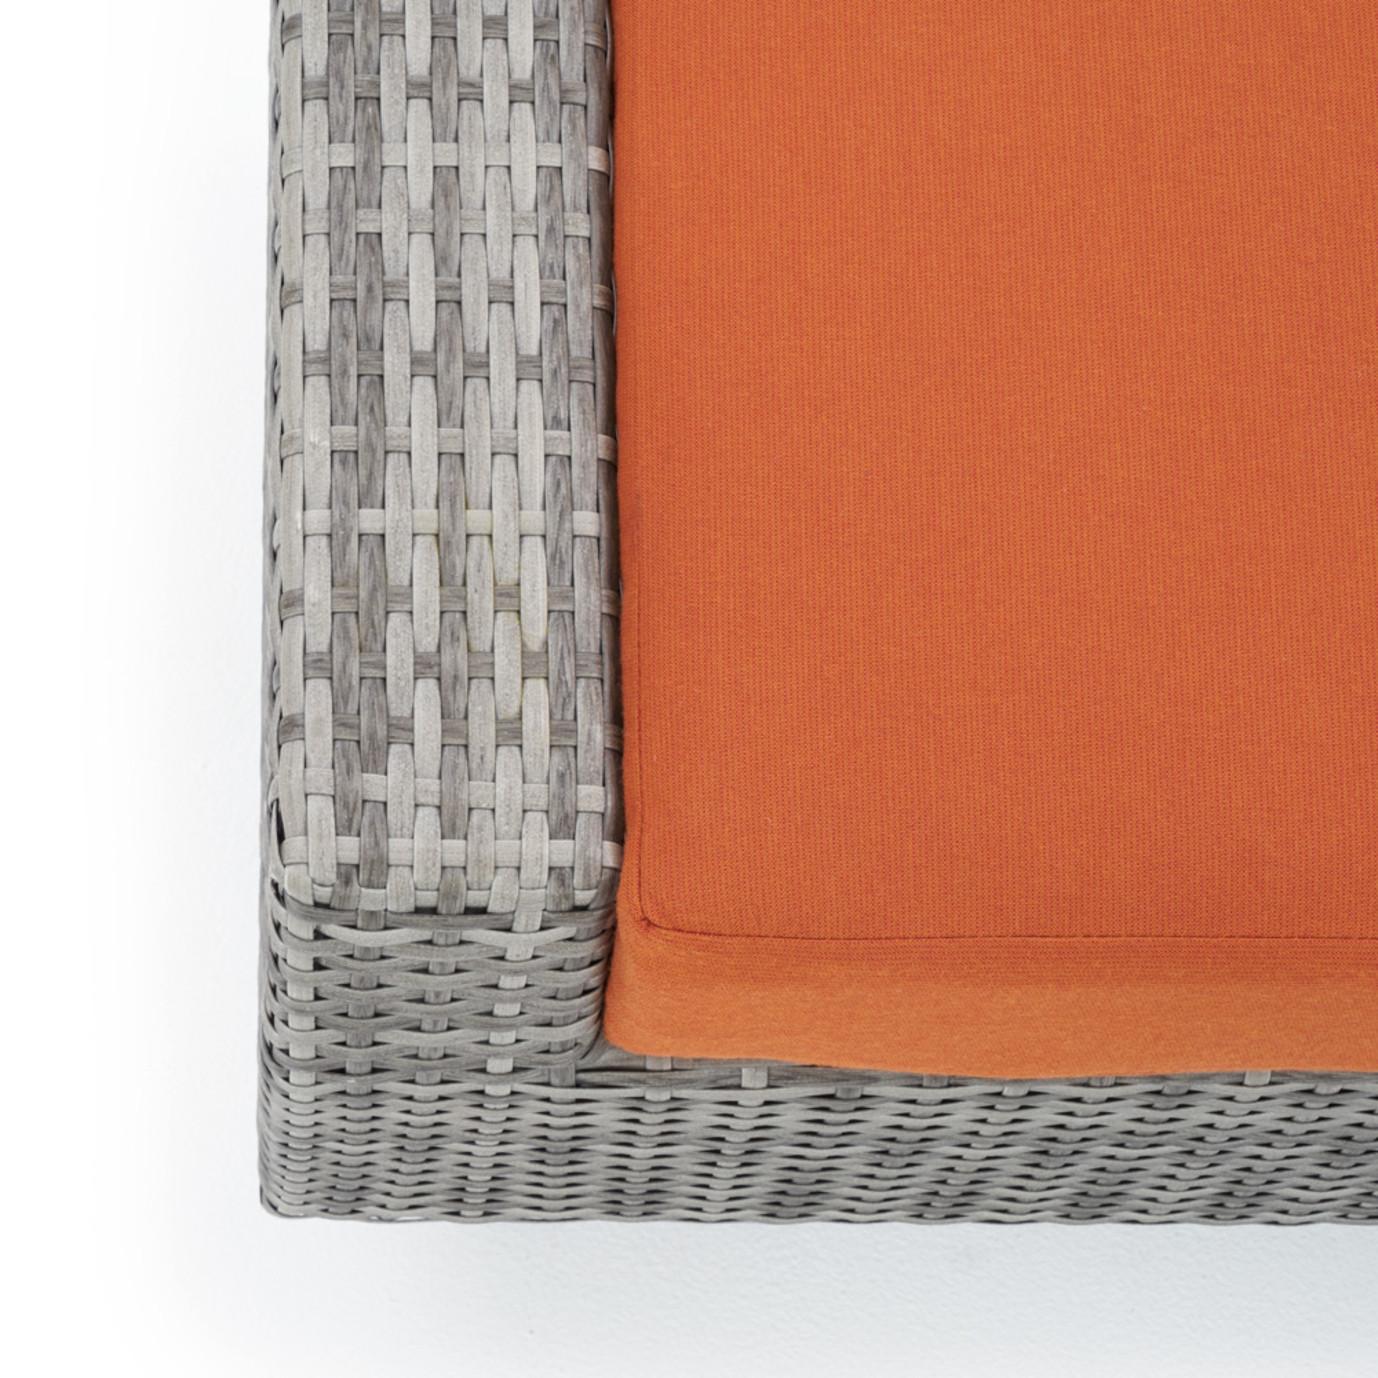 Cannes™ Deluxe 8pc Sofa & Club Chair Set - Tikka Orange